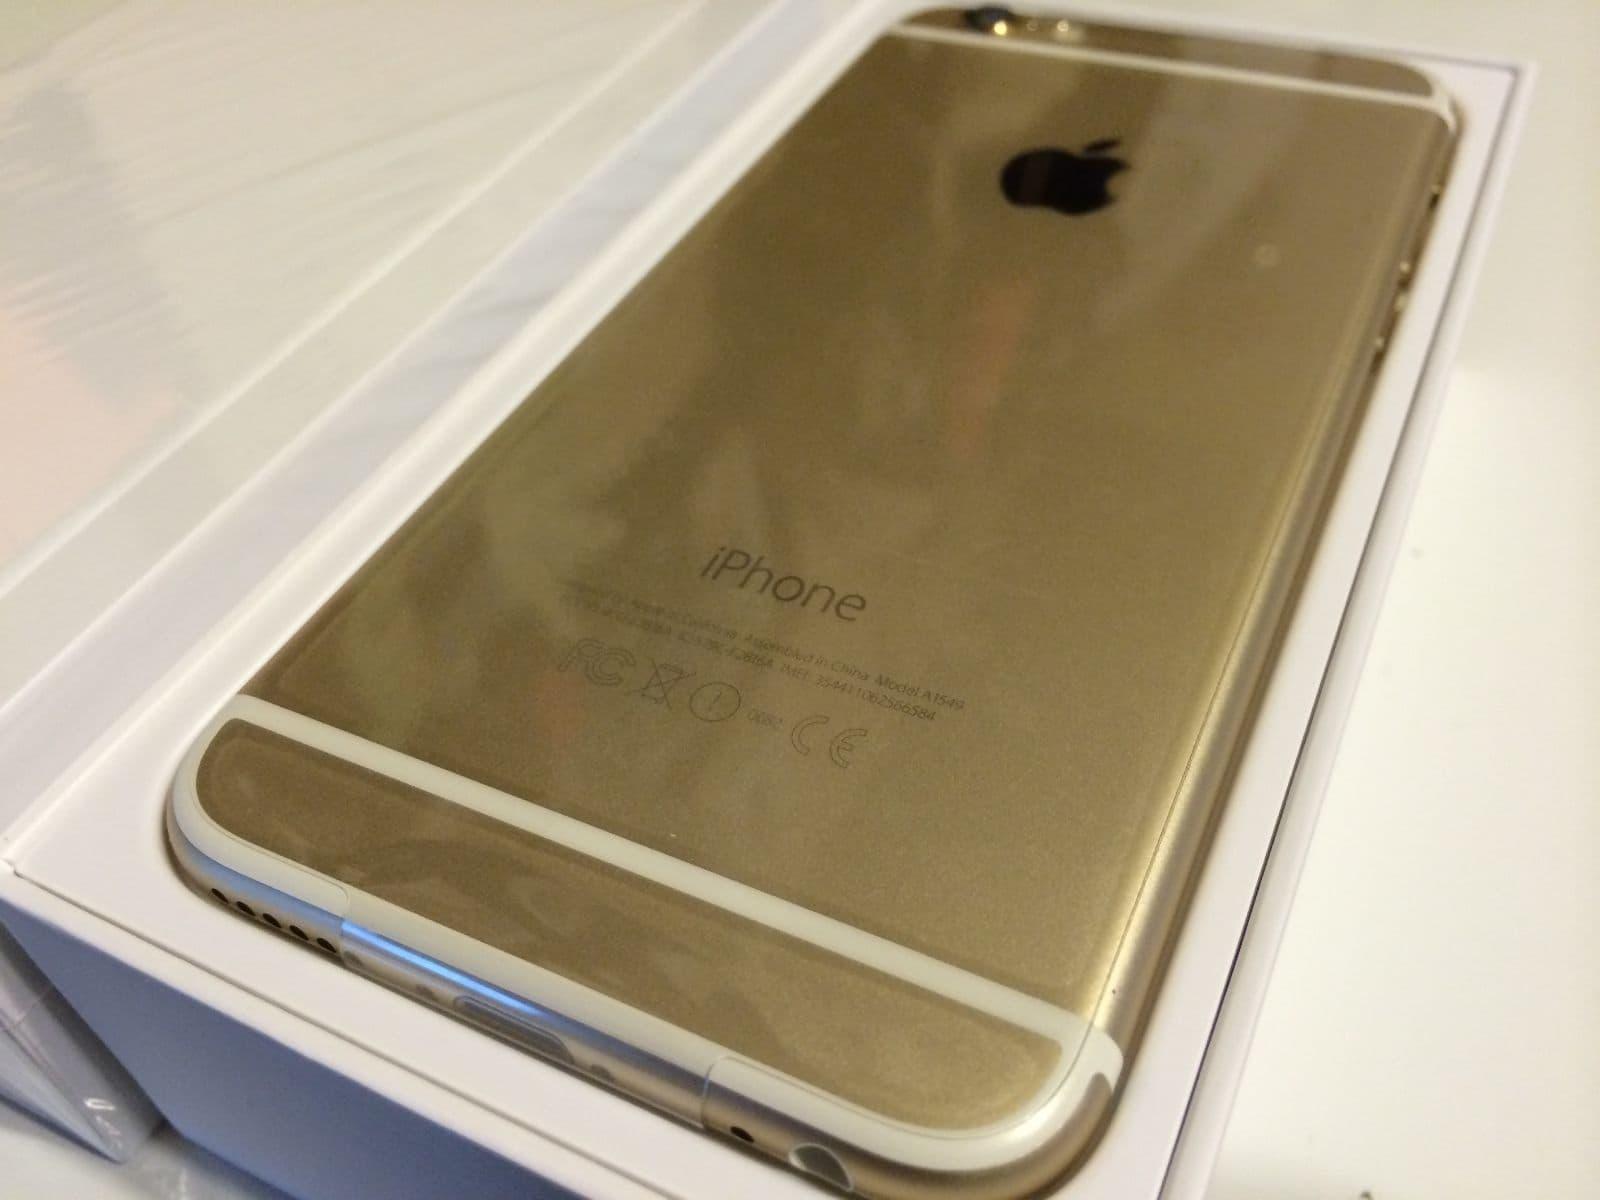 Iphone 5s Gold 16gb Price